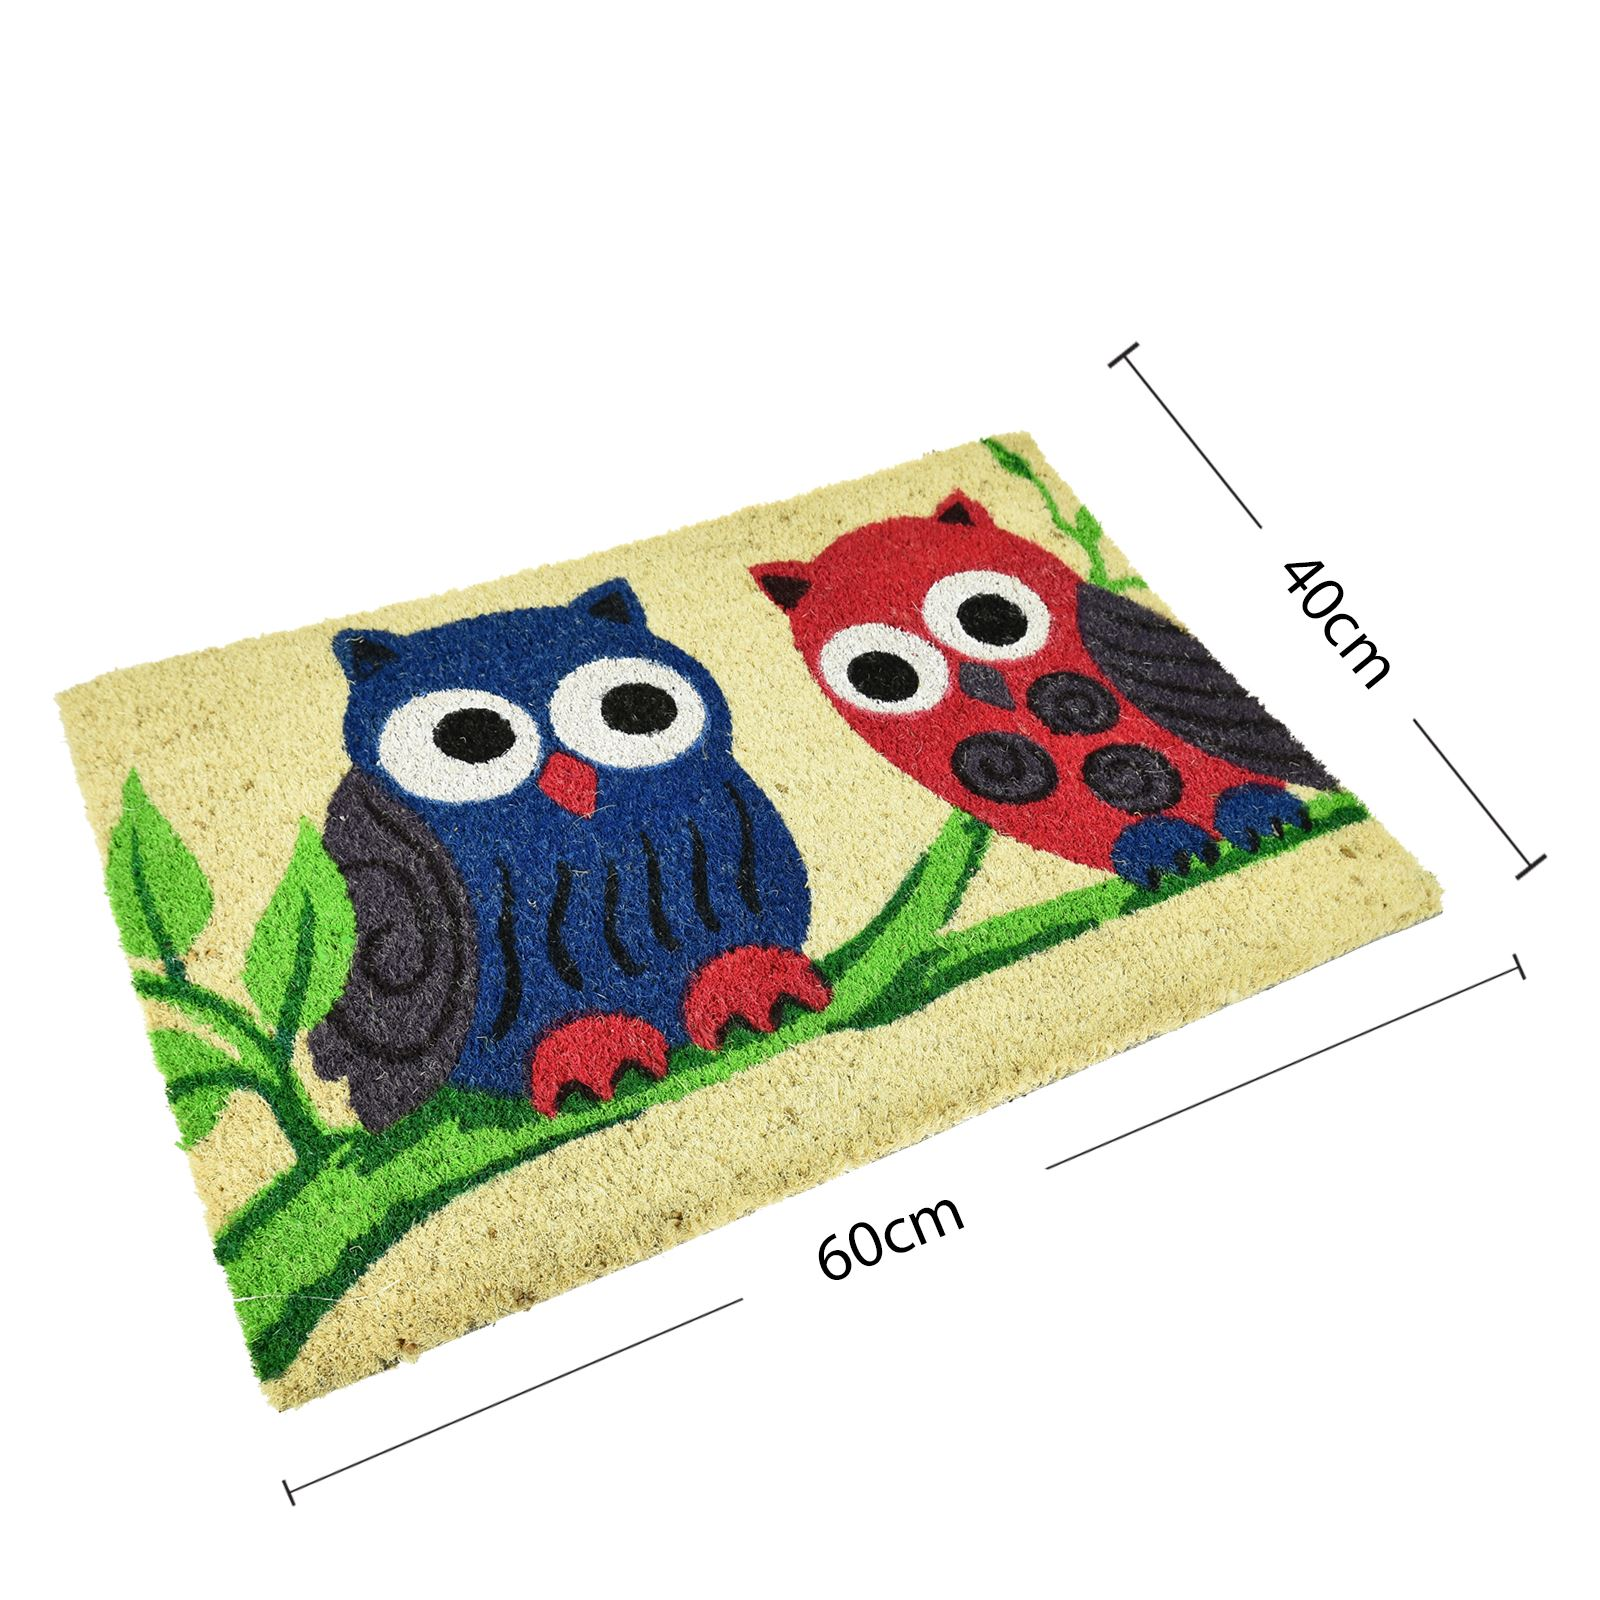 Plain-Non-Slip-Door-Mat-Tough-Natural-Coir-PVC-Back-Welcome-Doormat-40-x-60cm miniatura 26